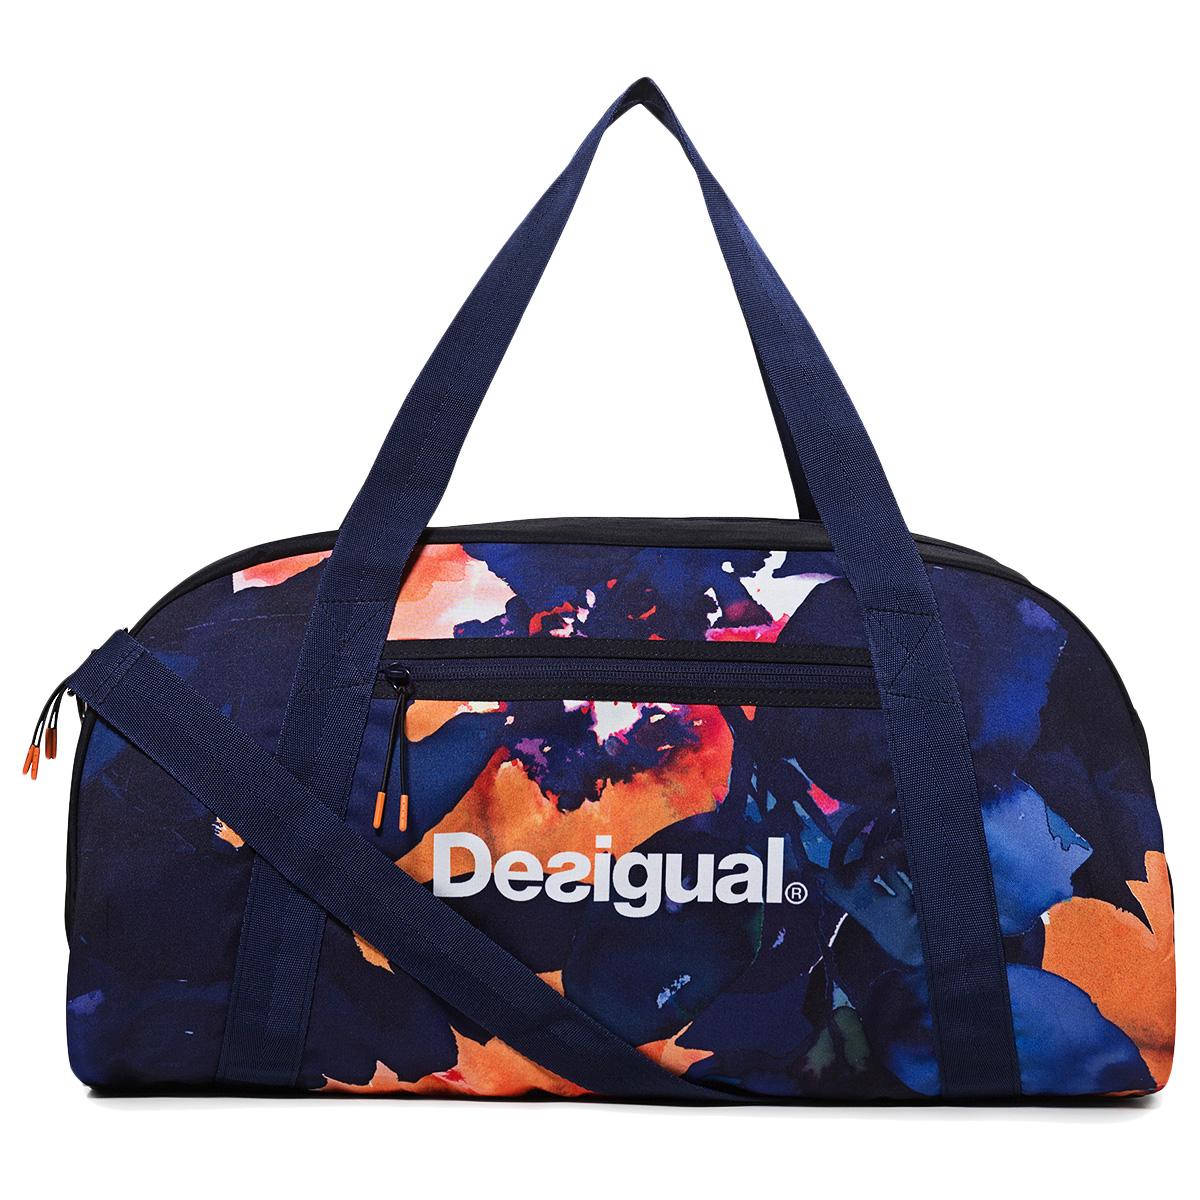 Desigual Damen Sporttasche Fitness Tasche Gym Bag Carry Tropic 18SQXW14//5013